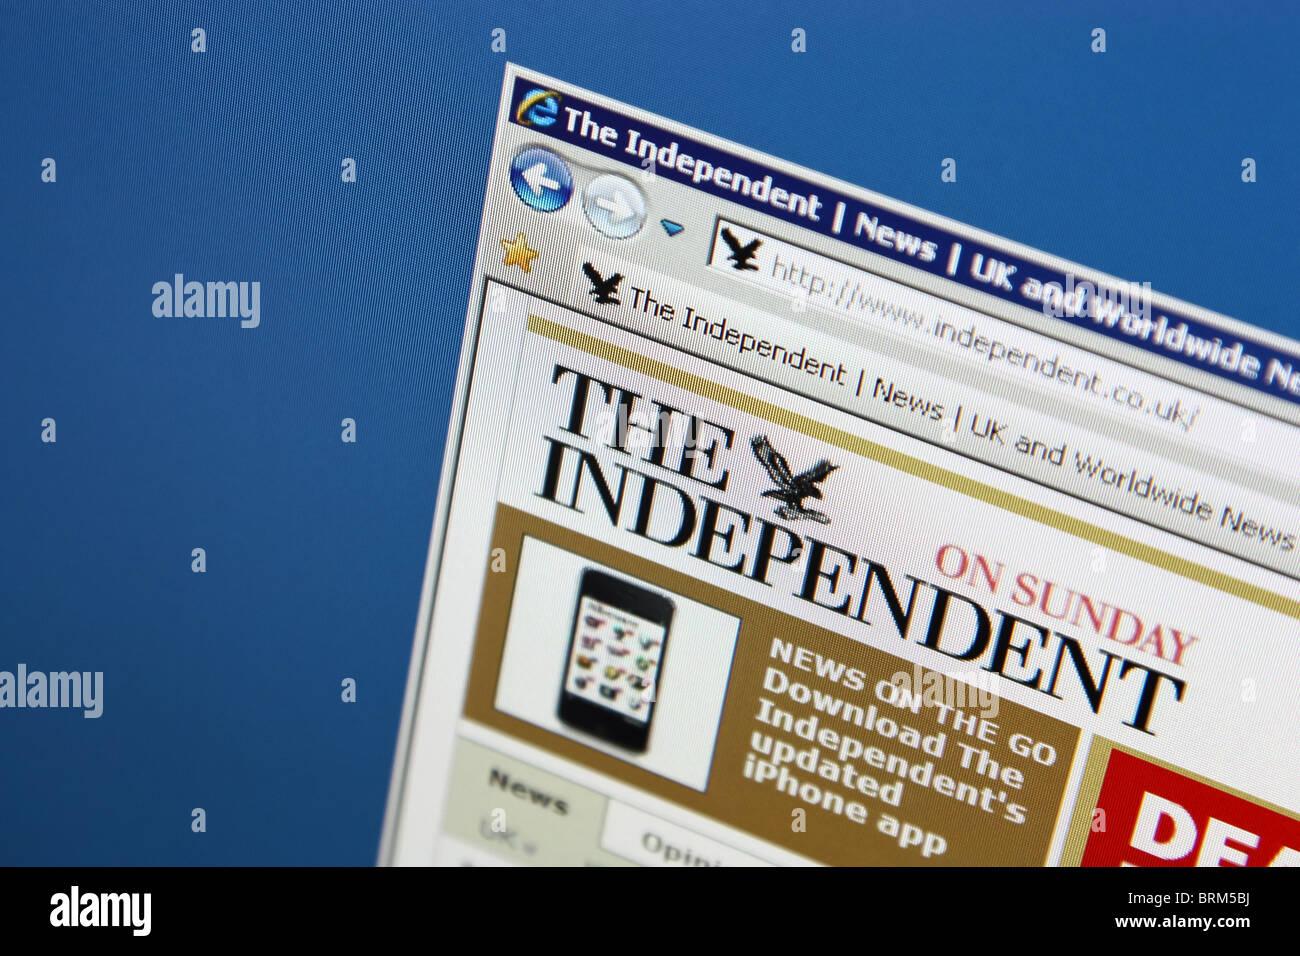 independent online news website screenshot - Stock Image